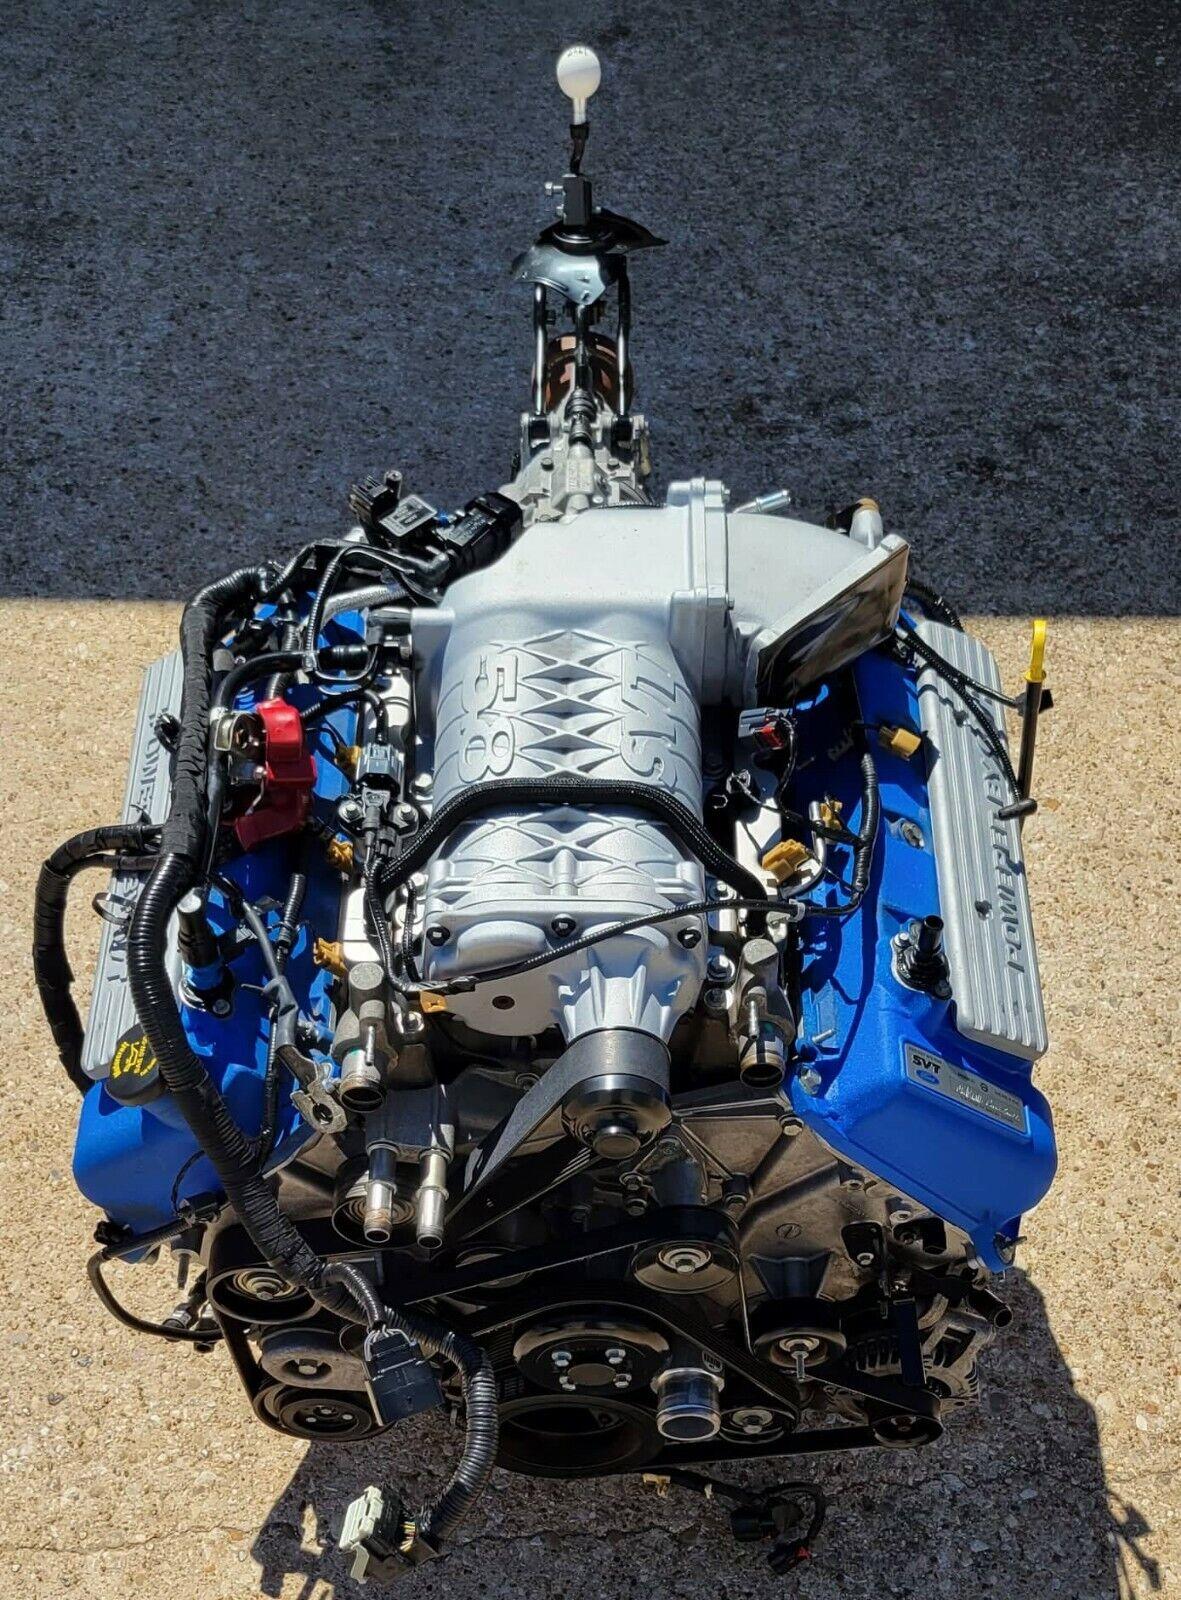 2013-2014 MUSTANG SHELBY COBRA GT500 5.8L 4V V8 SUPERCHARGED PULLOUT 28K